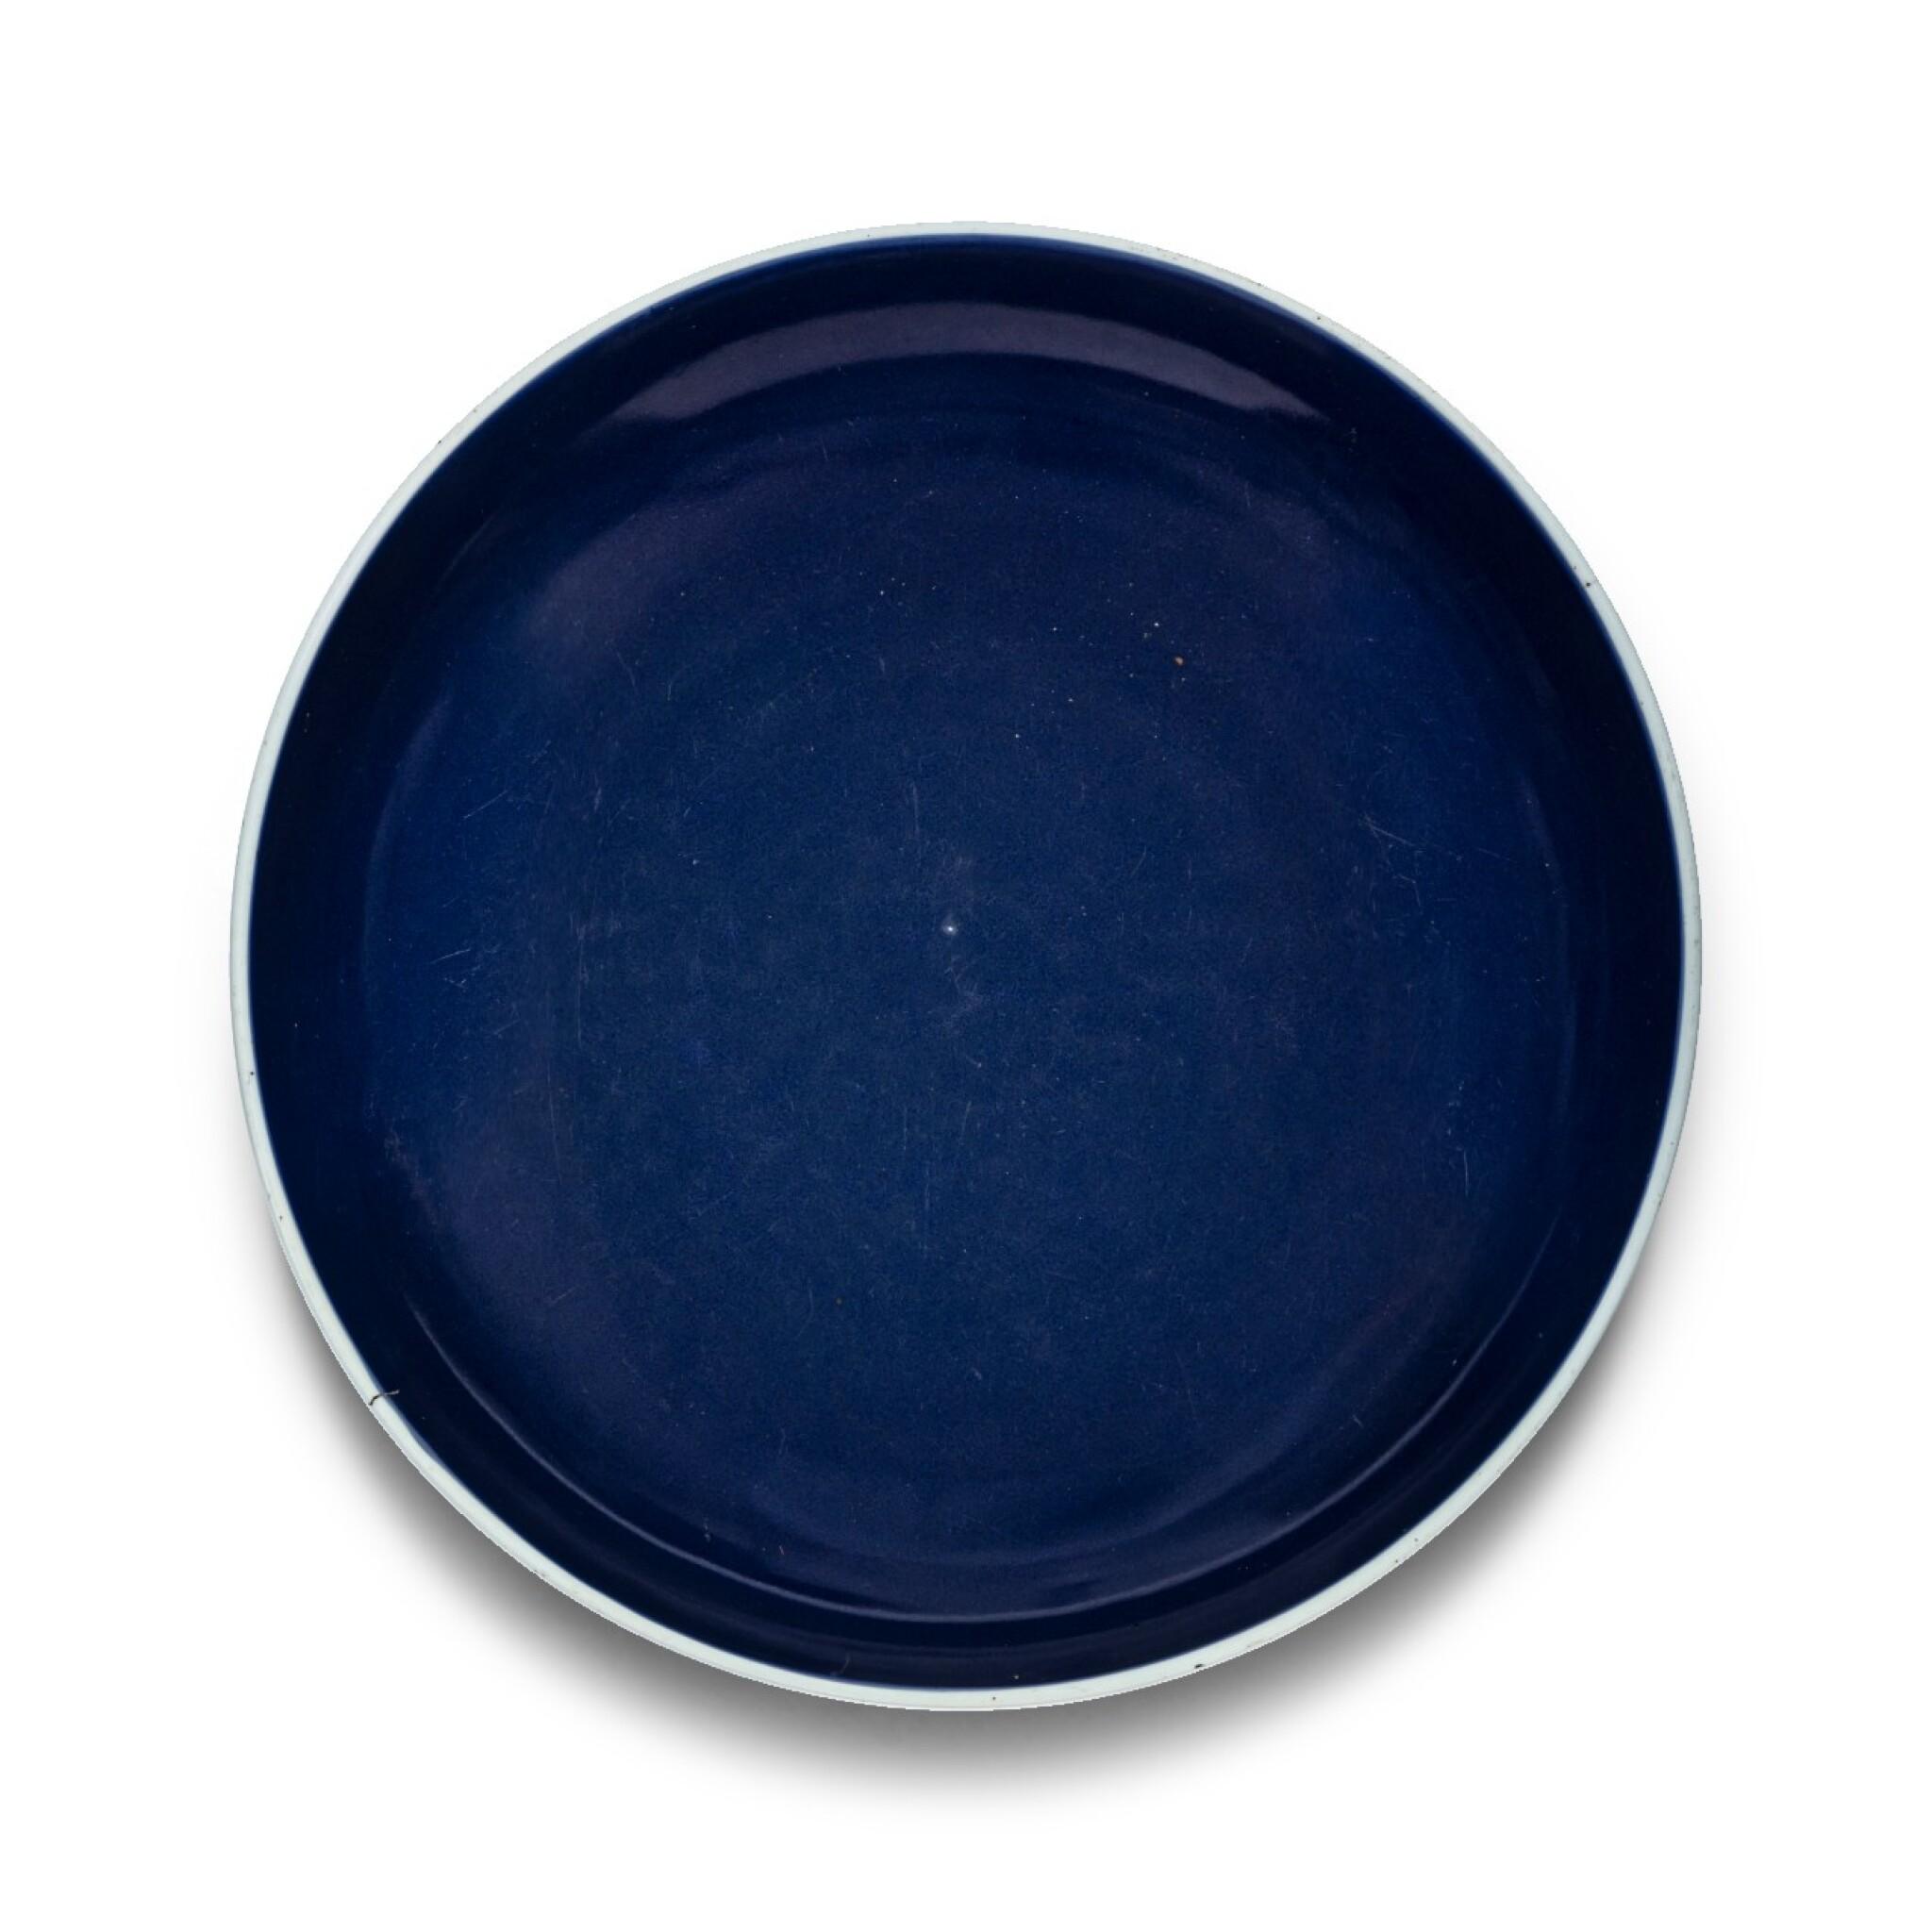 View 1 of Lot 17. Grand plat en porcelaine monochrome bleu Dynastie Qing, XVIIIE siècle   清十八世紀 灑藍釉圓盤   A large sacrificial blue-glazed charger, Qing Dynasty, 18th century.